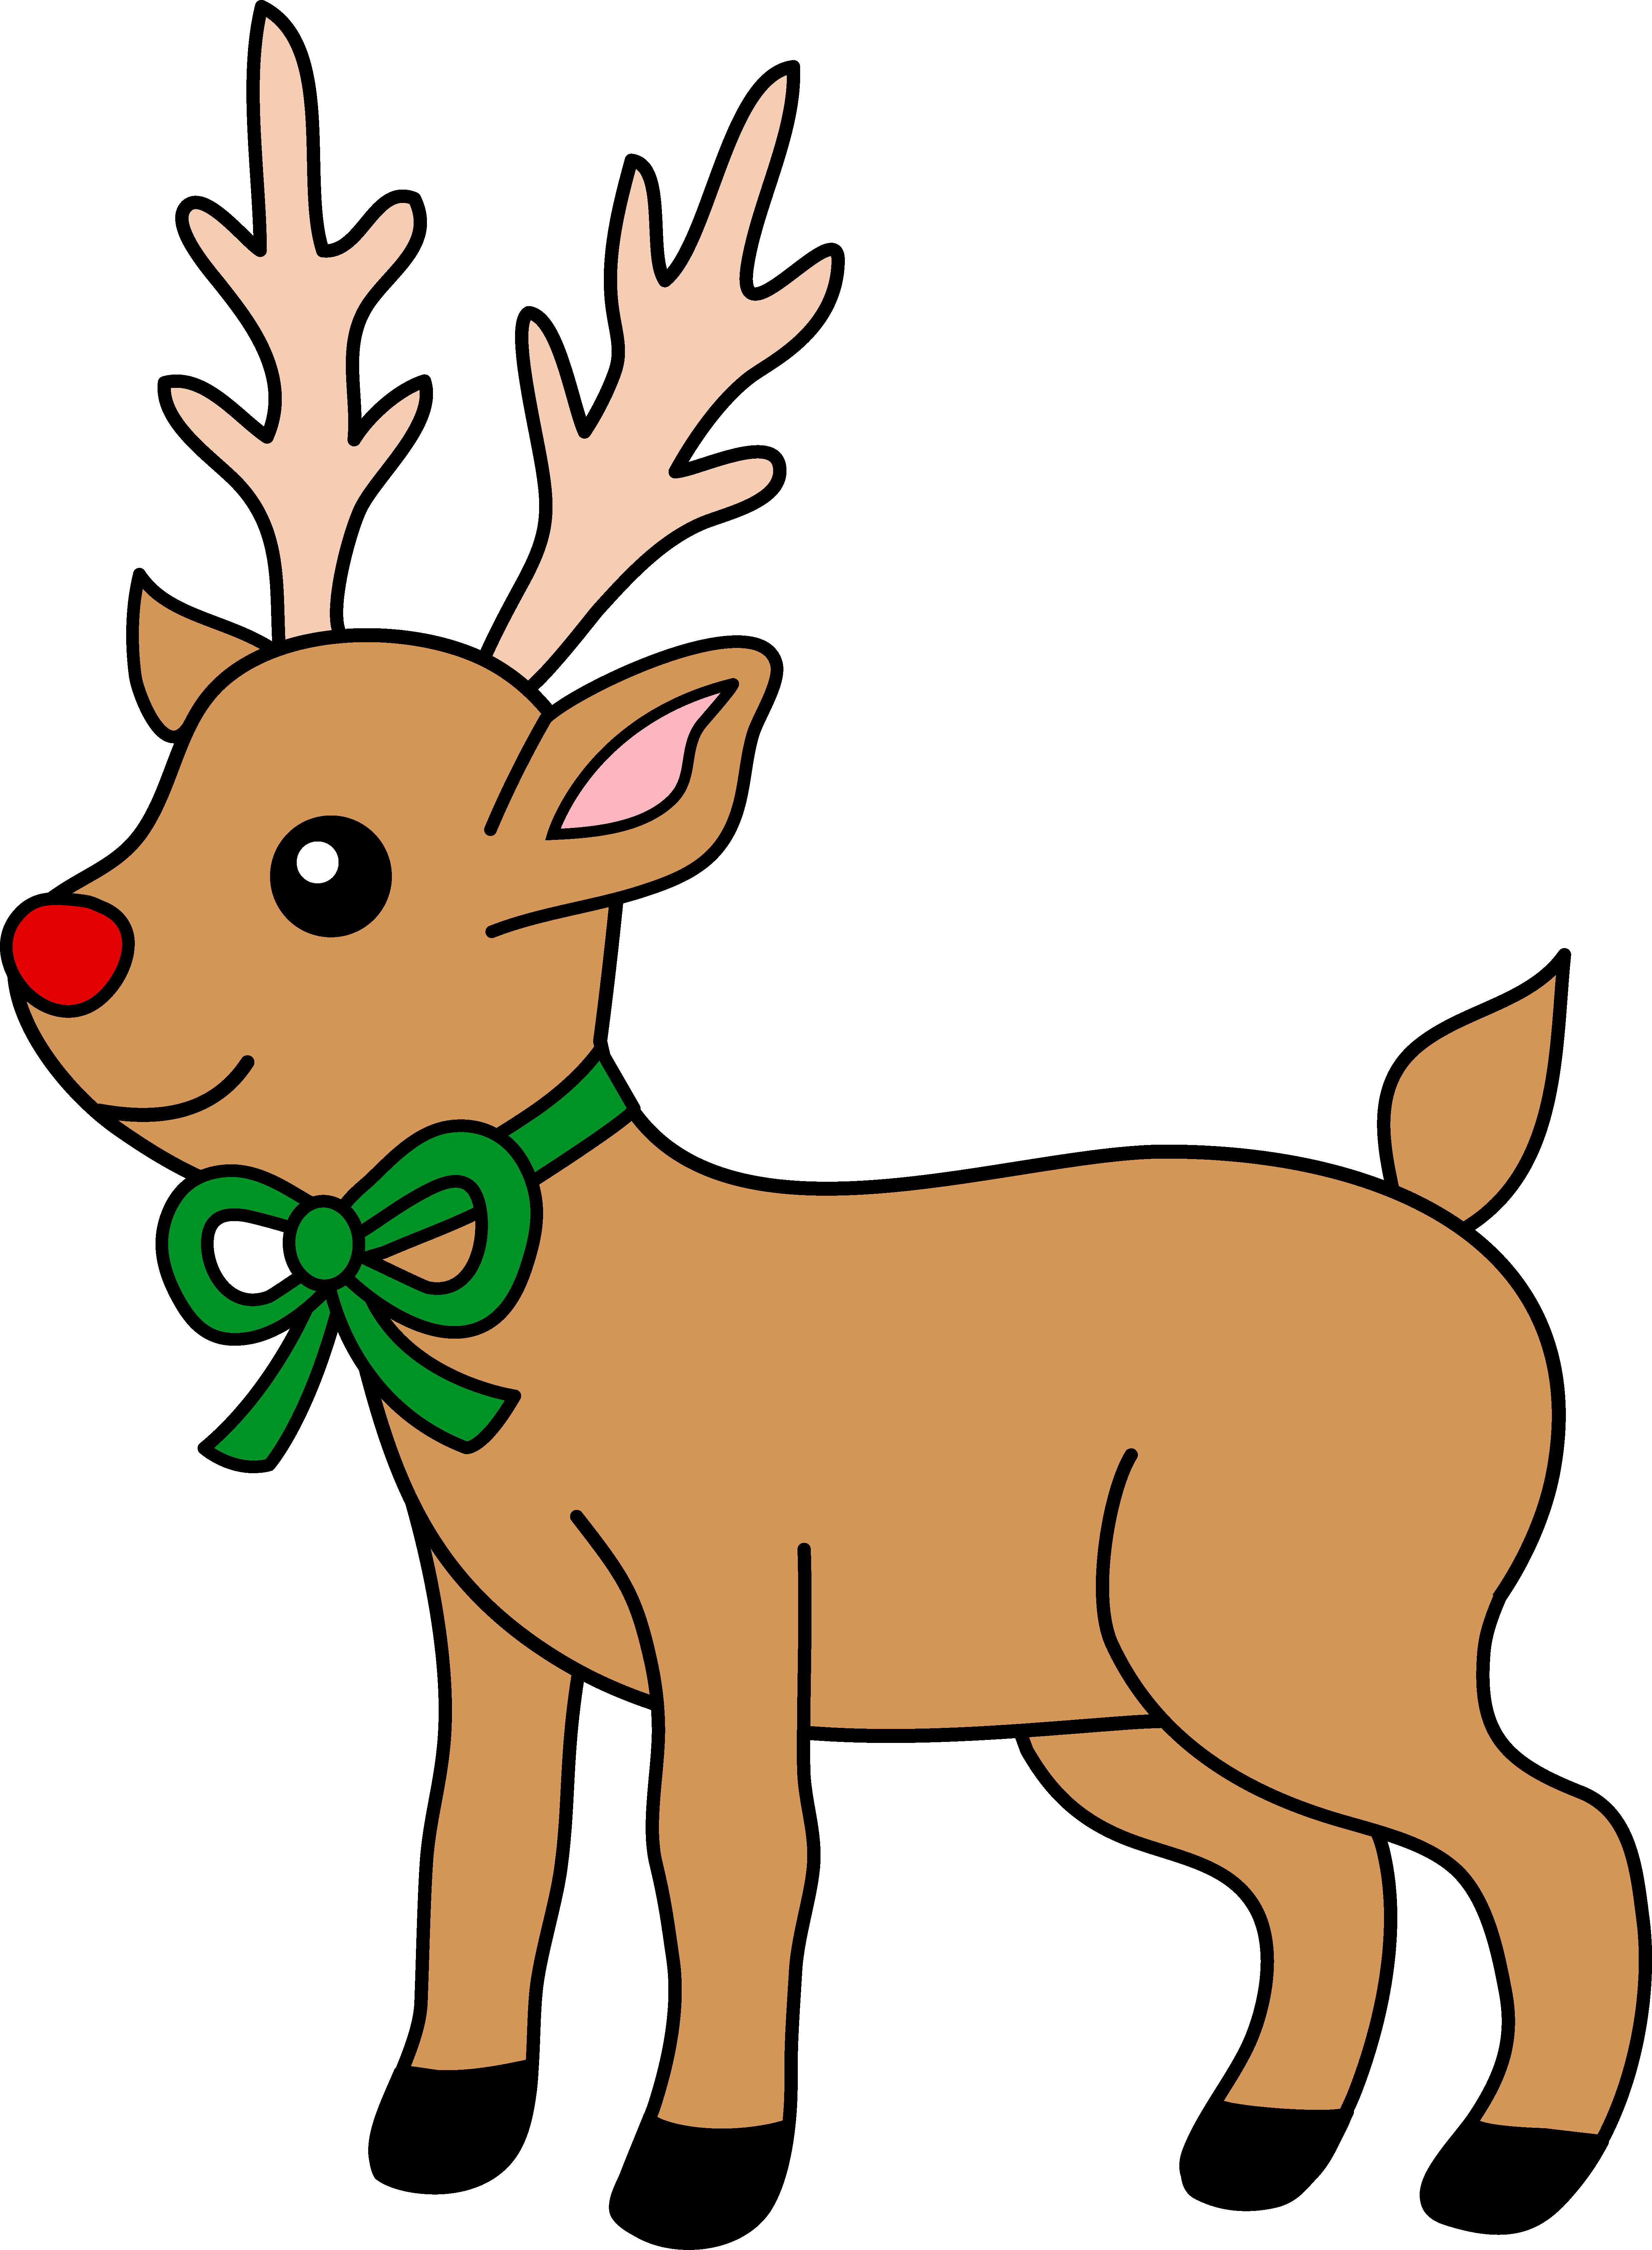 Cartoon Reindeer Clipart | Free download best Cartoon Reindeer ... png free